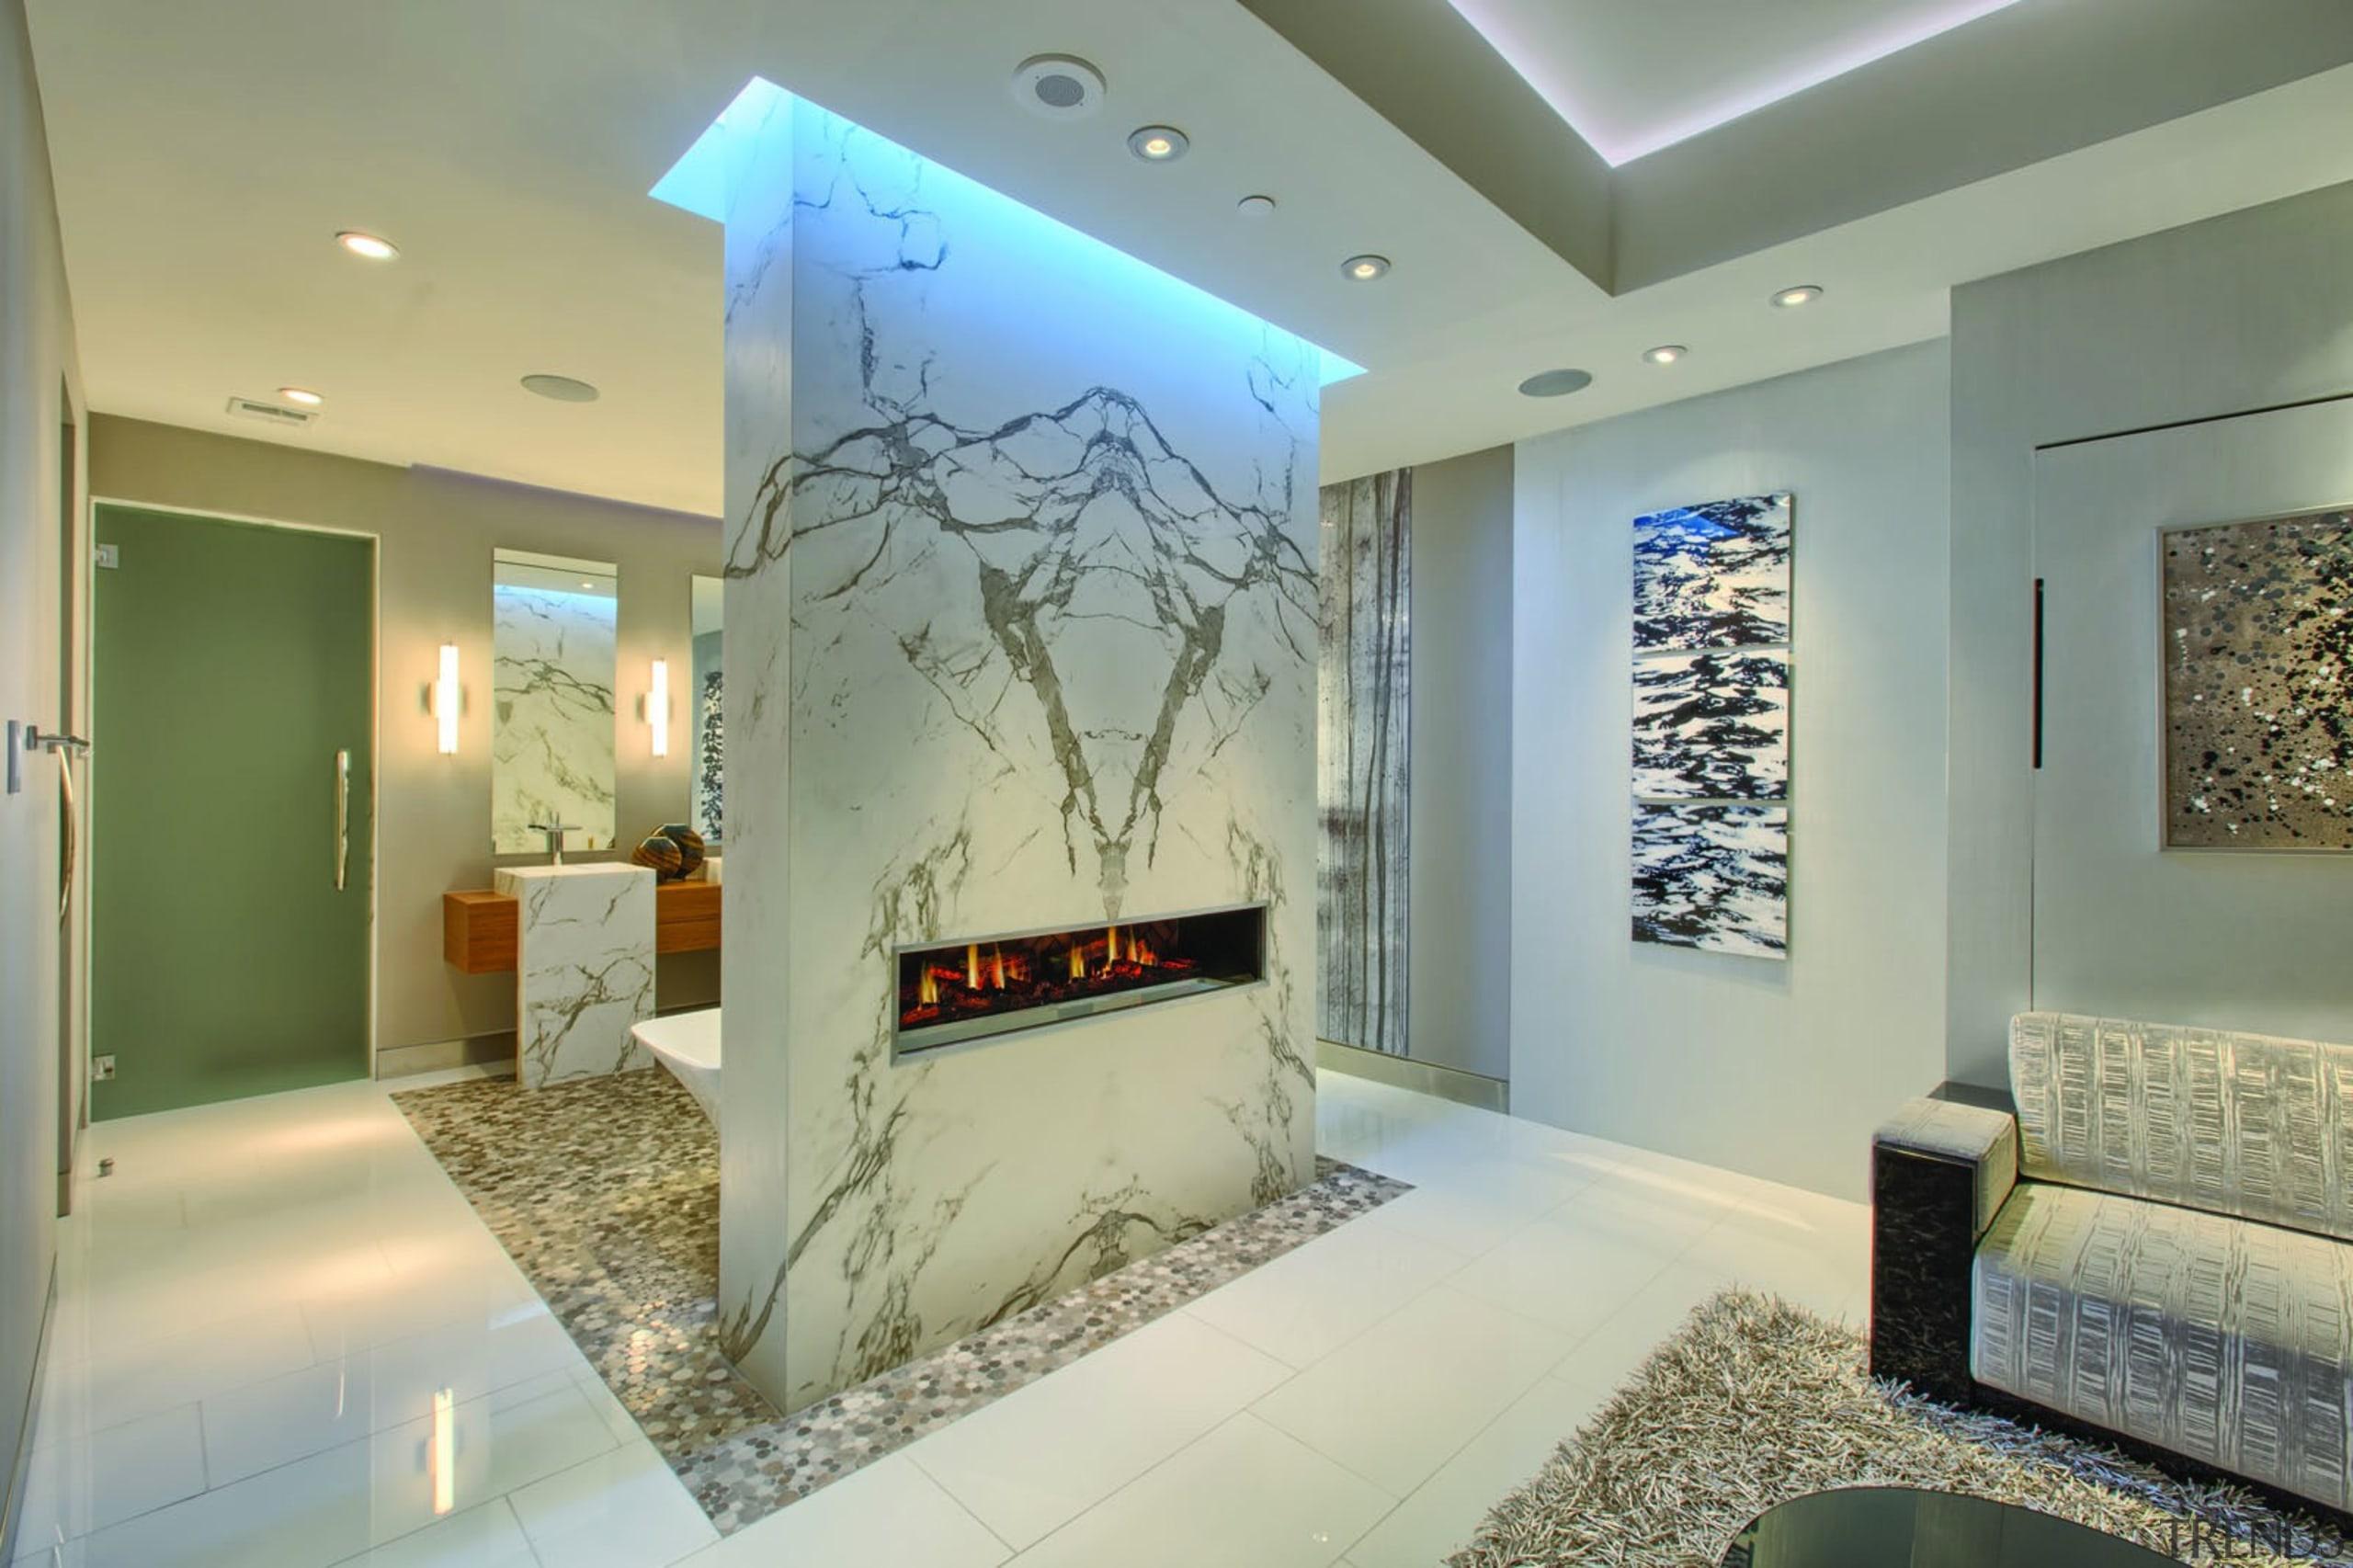 Aura mandarin unit4307 - 110 - Aura mandarin ceiling, home, interior design, living room, lobby, real estate, wall, gray